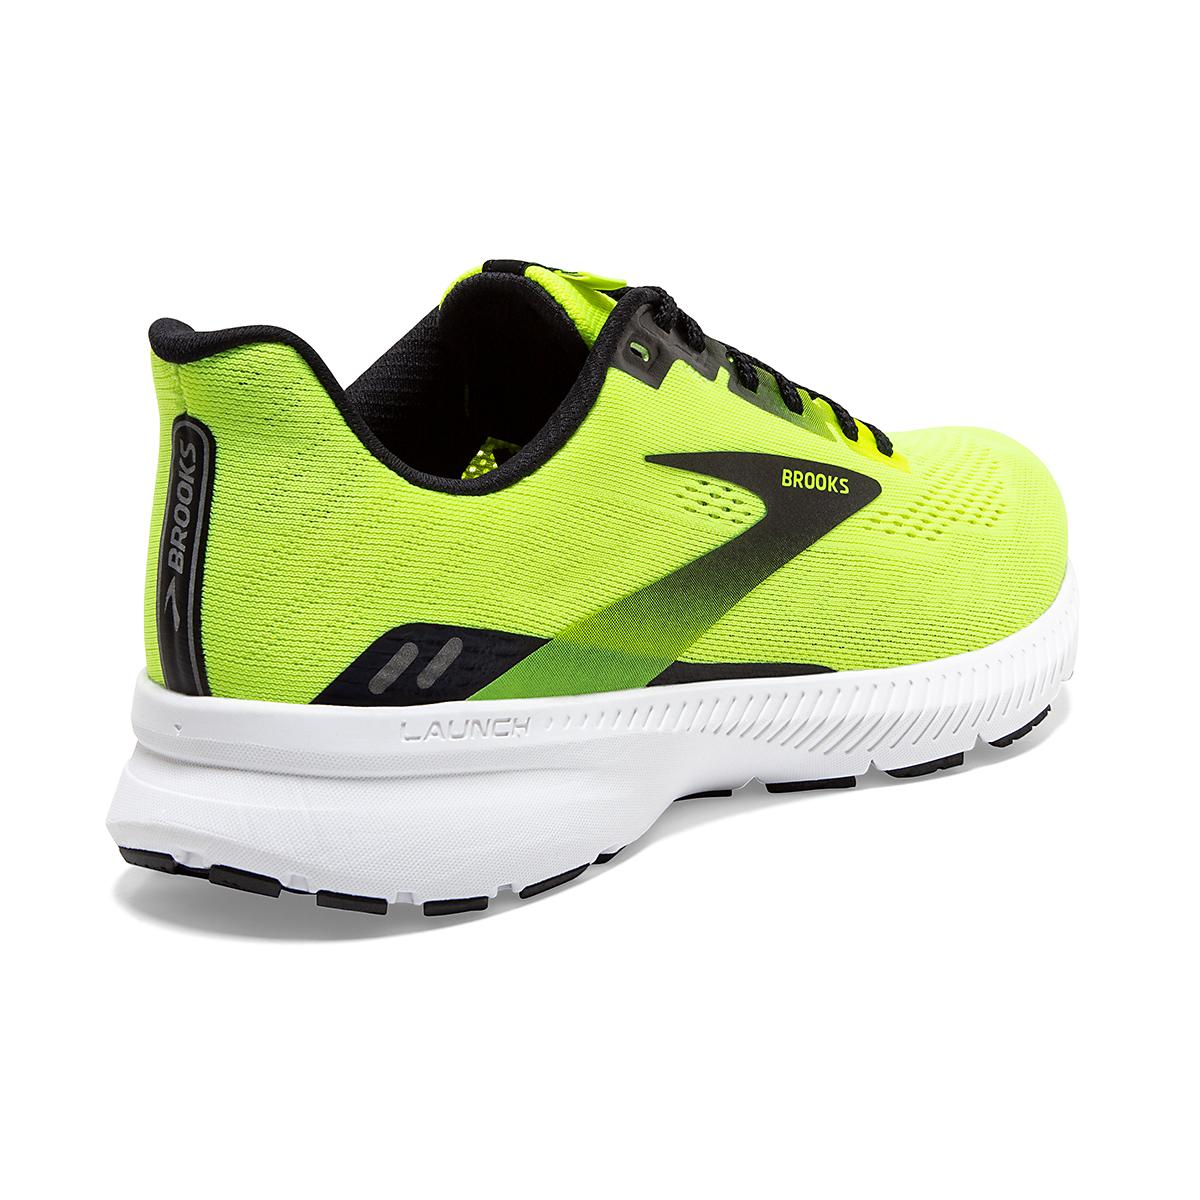 Men's Brooks Launch 8 Running Shoe - Color: Nightlife/Black/White - Size: 7 - Width: Regular, Nightlife/Black/White, large, image 3